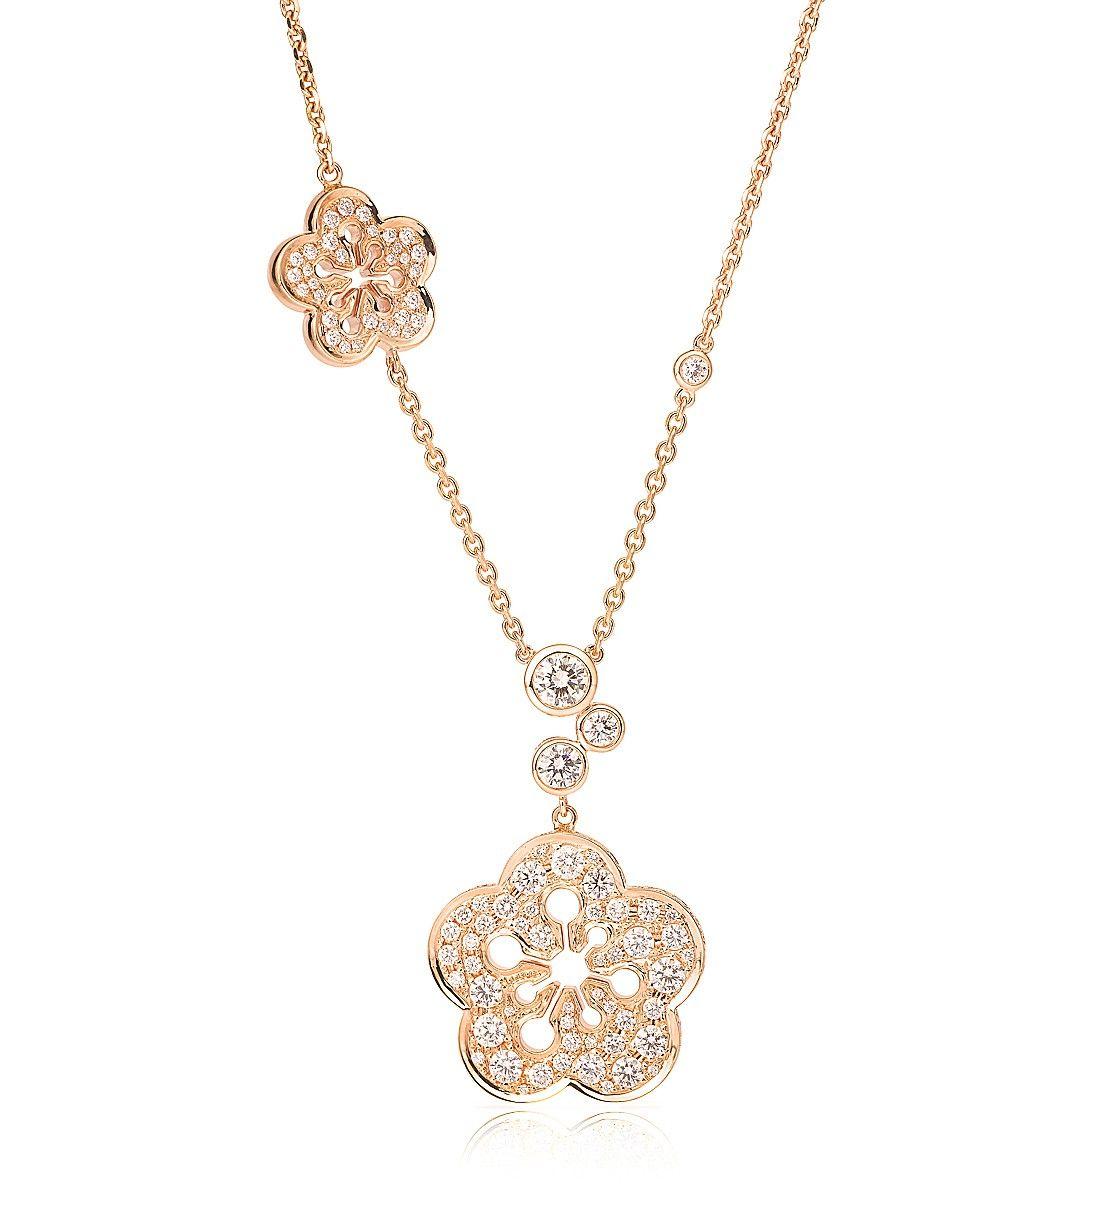 Puean impressive elegant pendant from boodlesu blossom collectionucp